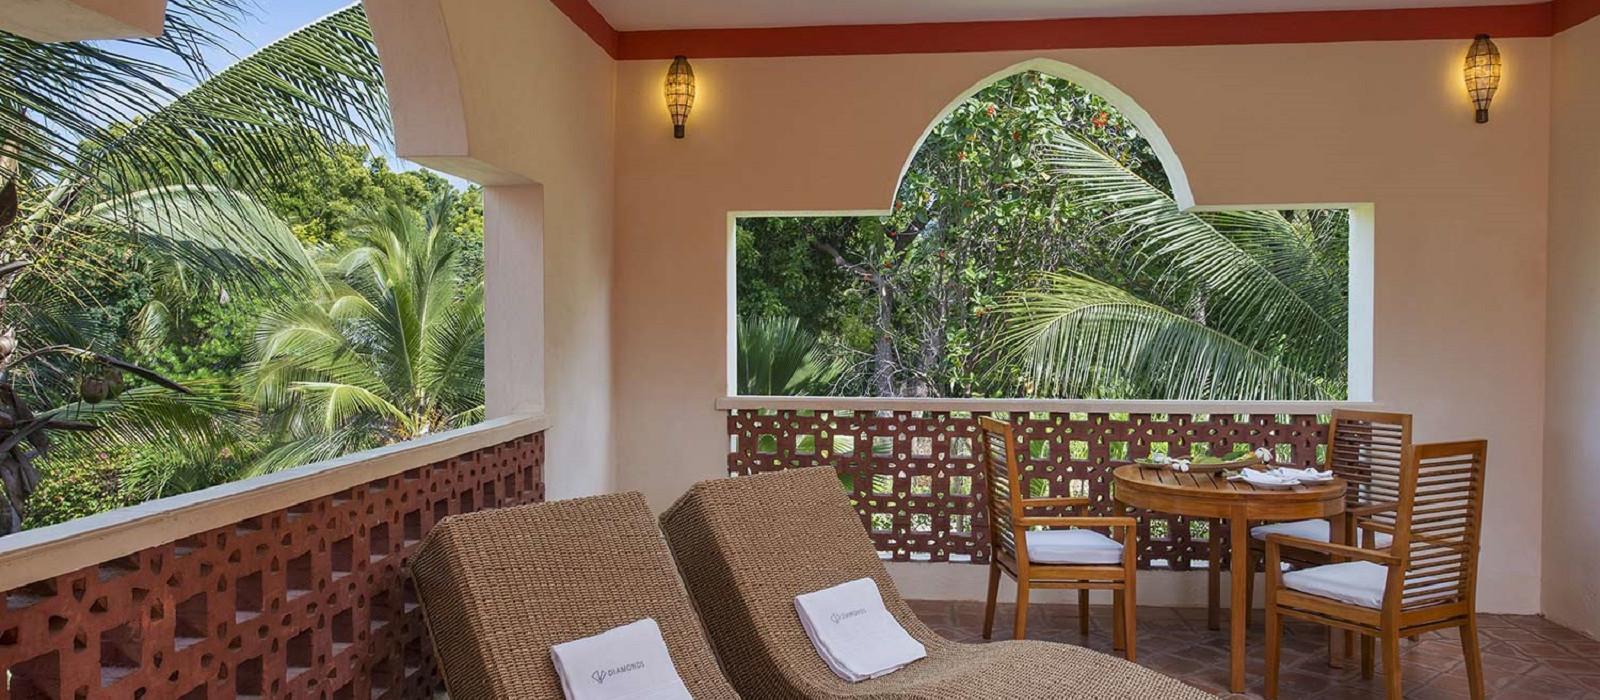 Hotel Diamonds Dream of Africa Kenya